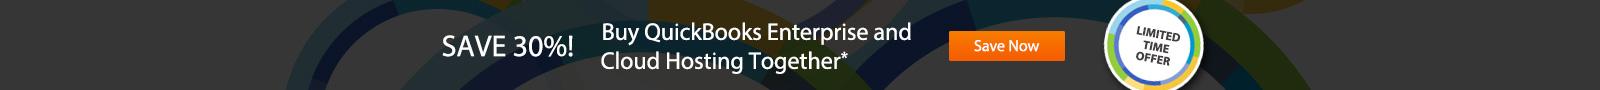 Save 30%! Buy QuickBooks Enterprise and Cloud Hosting together